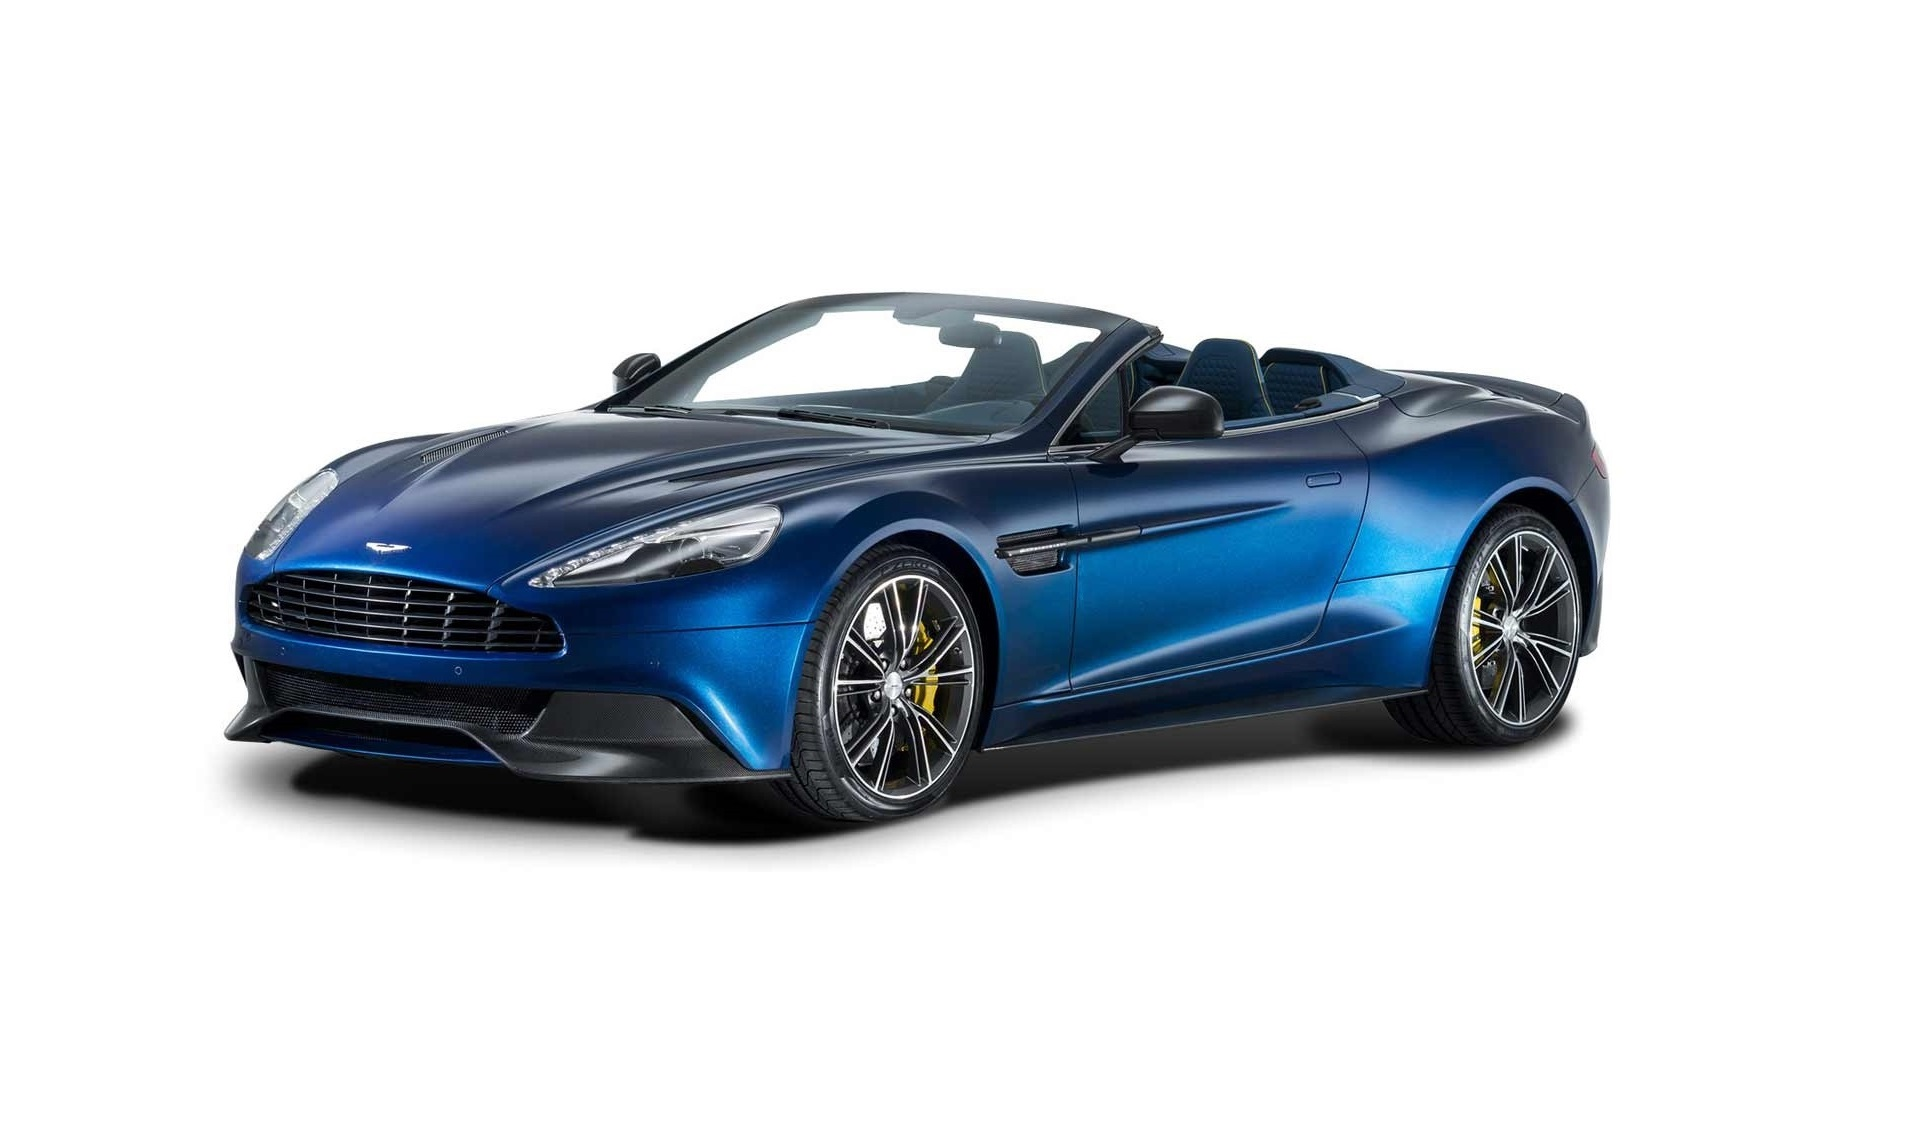 Aston Martin Vanquish Volante 2019, Saudi Arabia